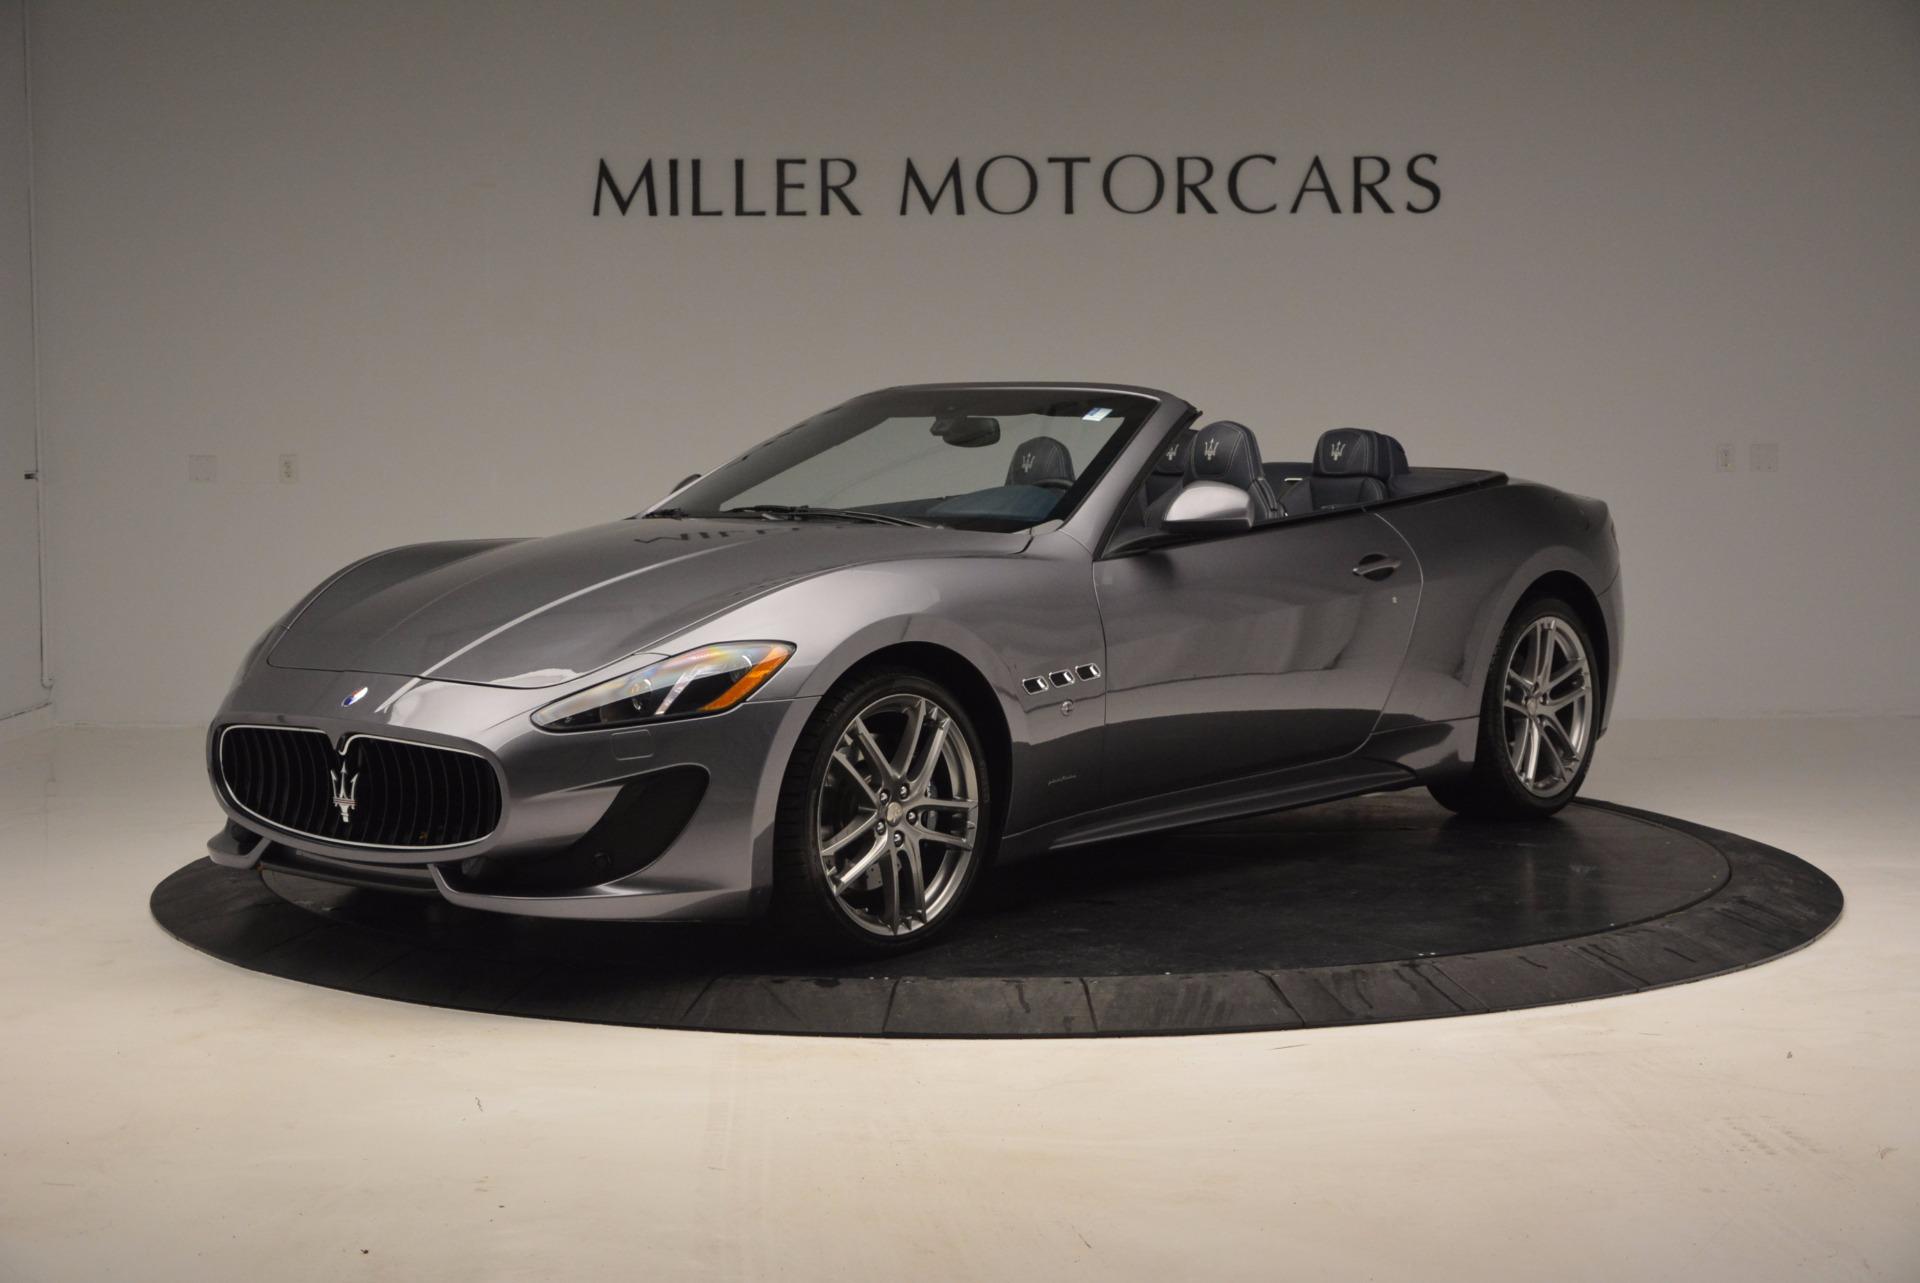 New 2017 Maserati GranTurismo Sport for sale Sold at Bentley Greenwich in Greenwich CT 06830 1